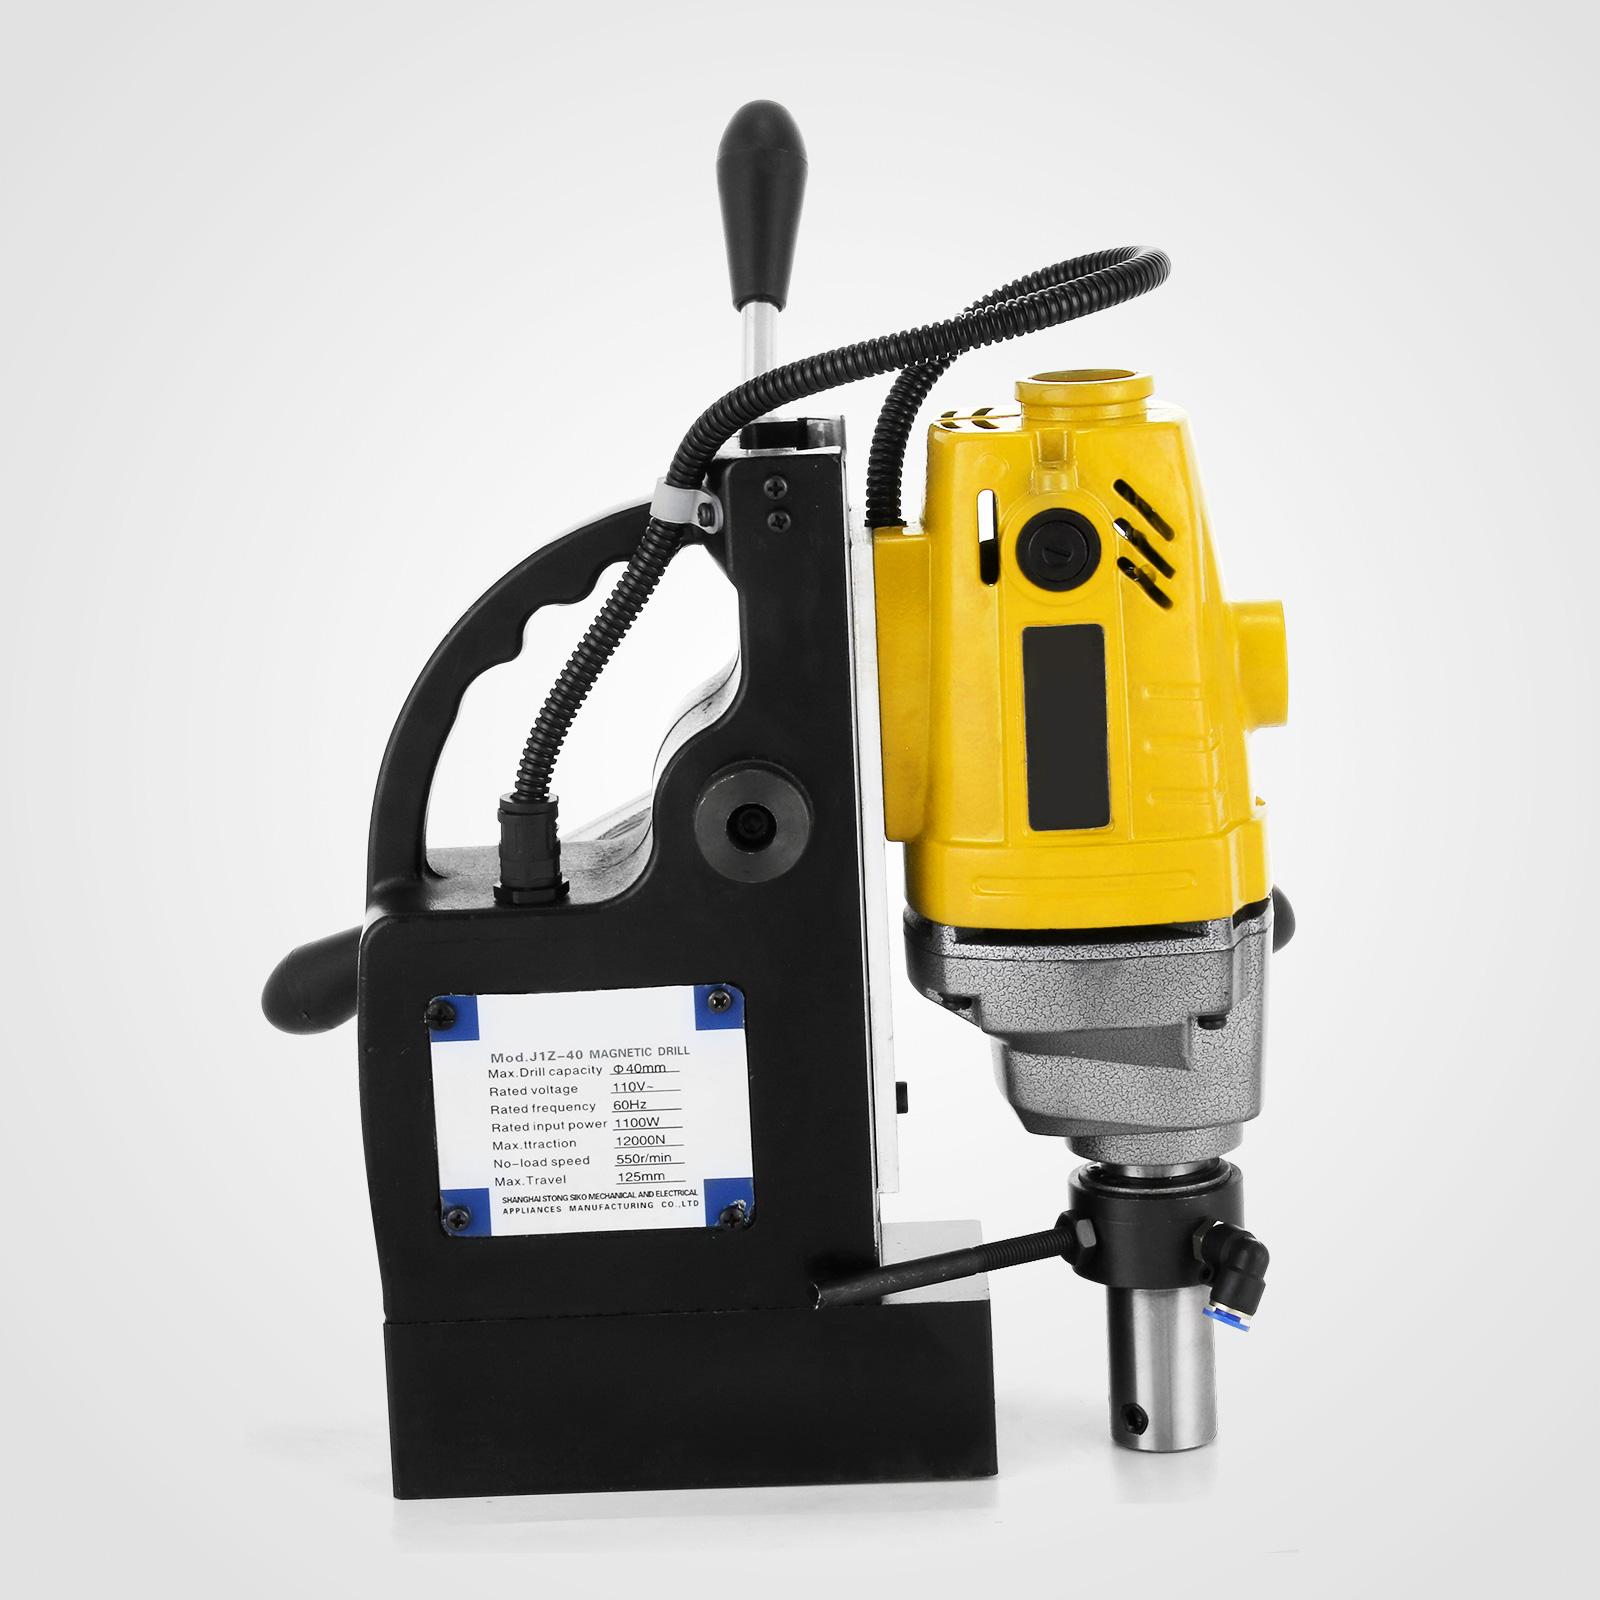 MB23-BRM35-MD40-Trapano-Perforatrice-Carotatore-Fresa-Magnetico-12-40mm-230V miniatura 30